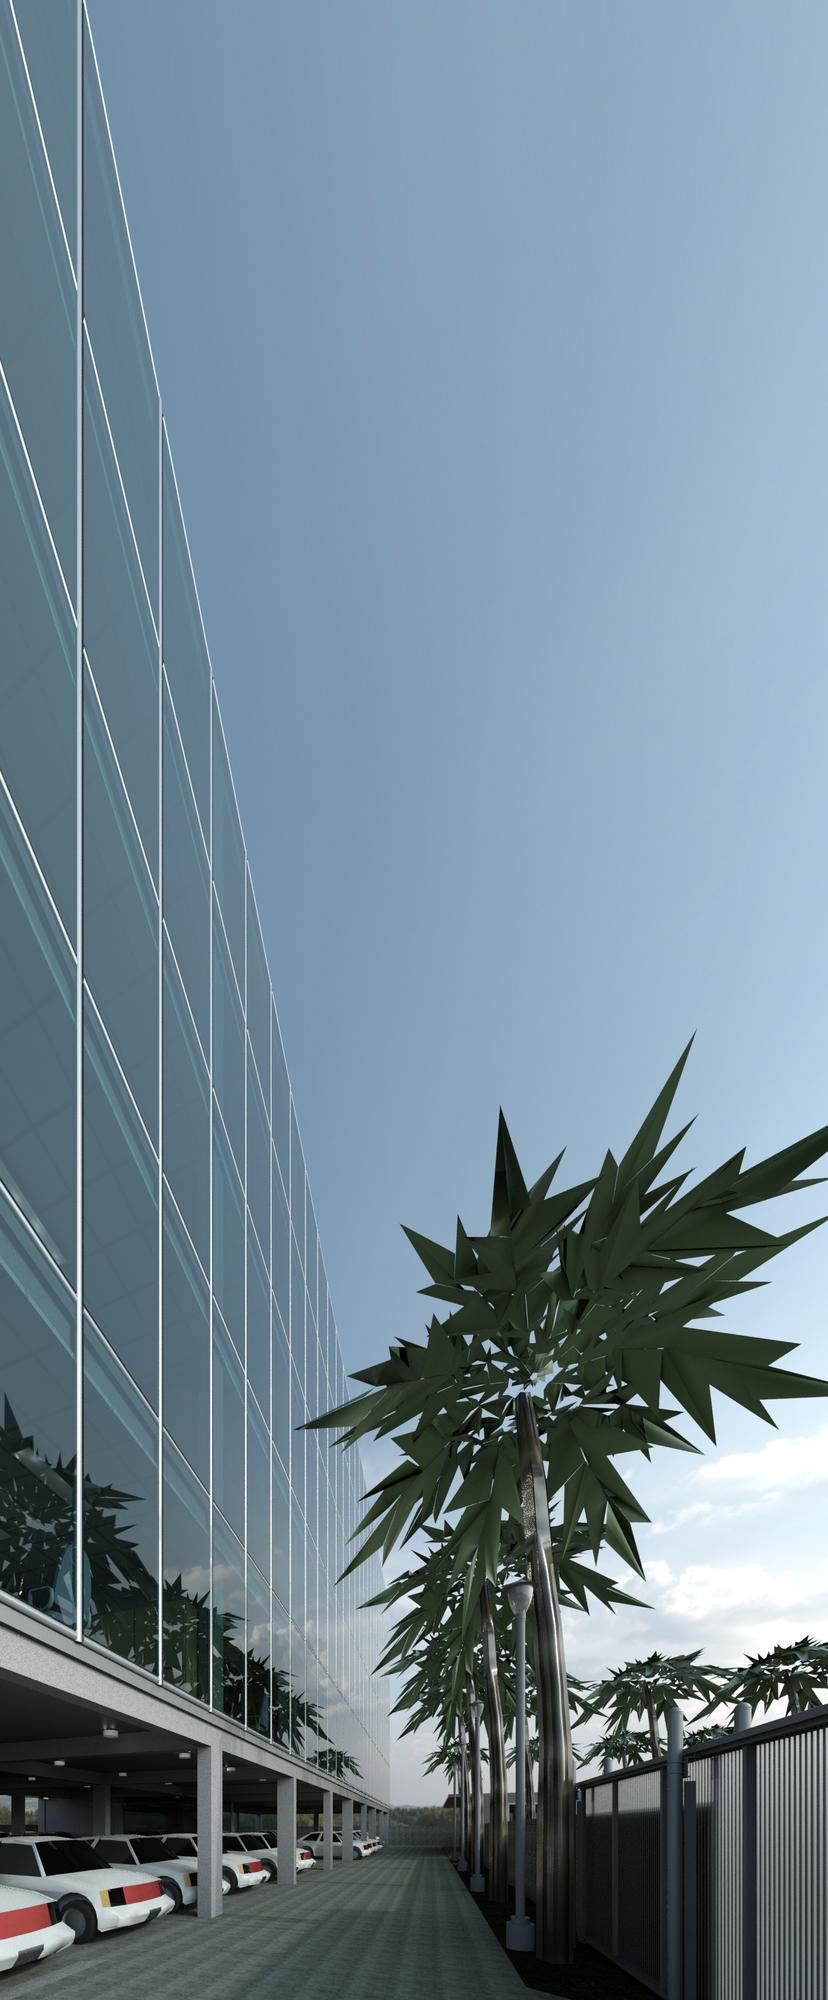 Raas-rendering20141111-24760-xwyuzx